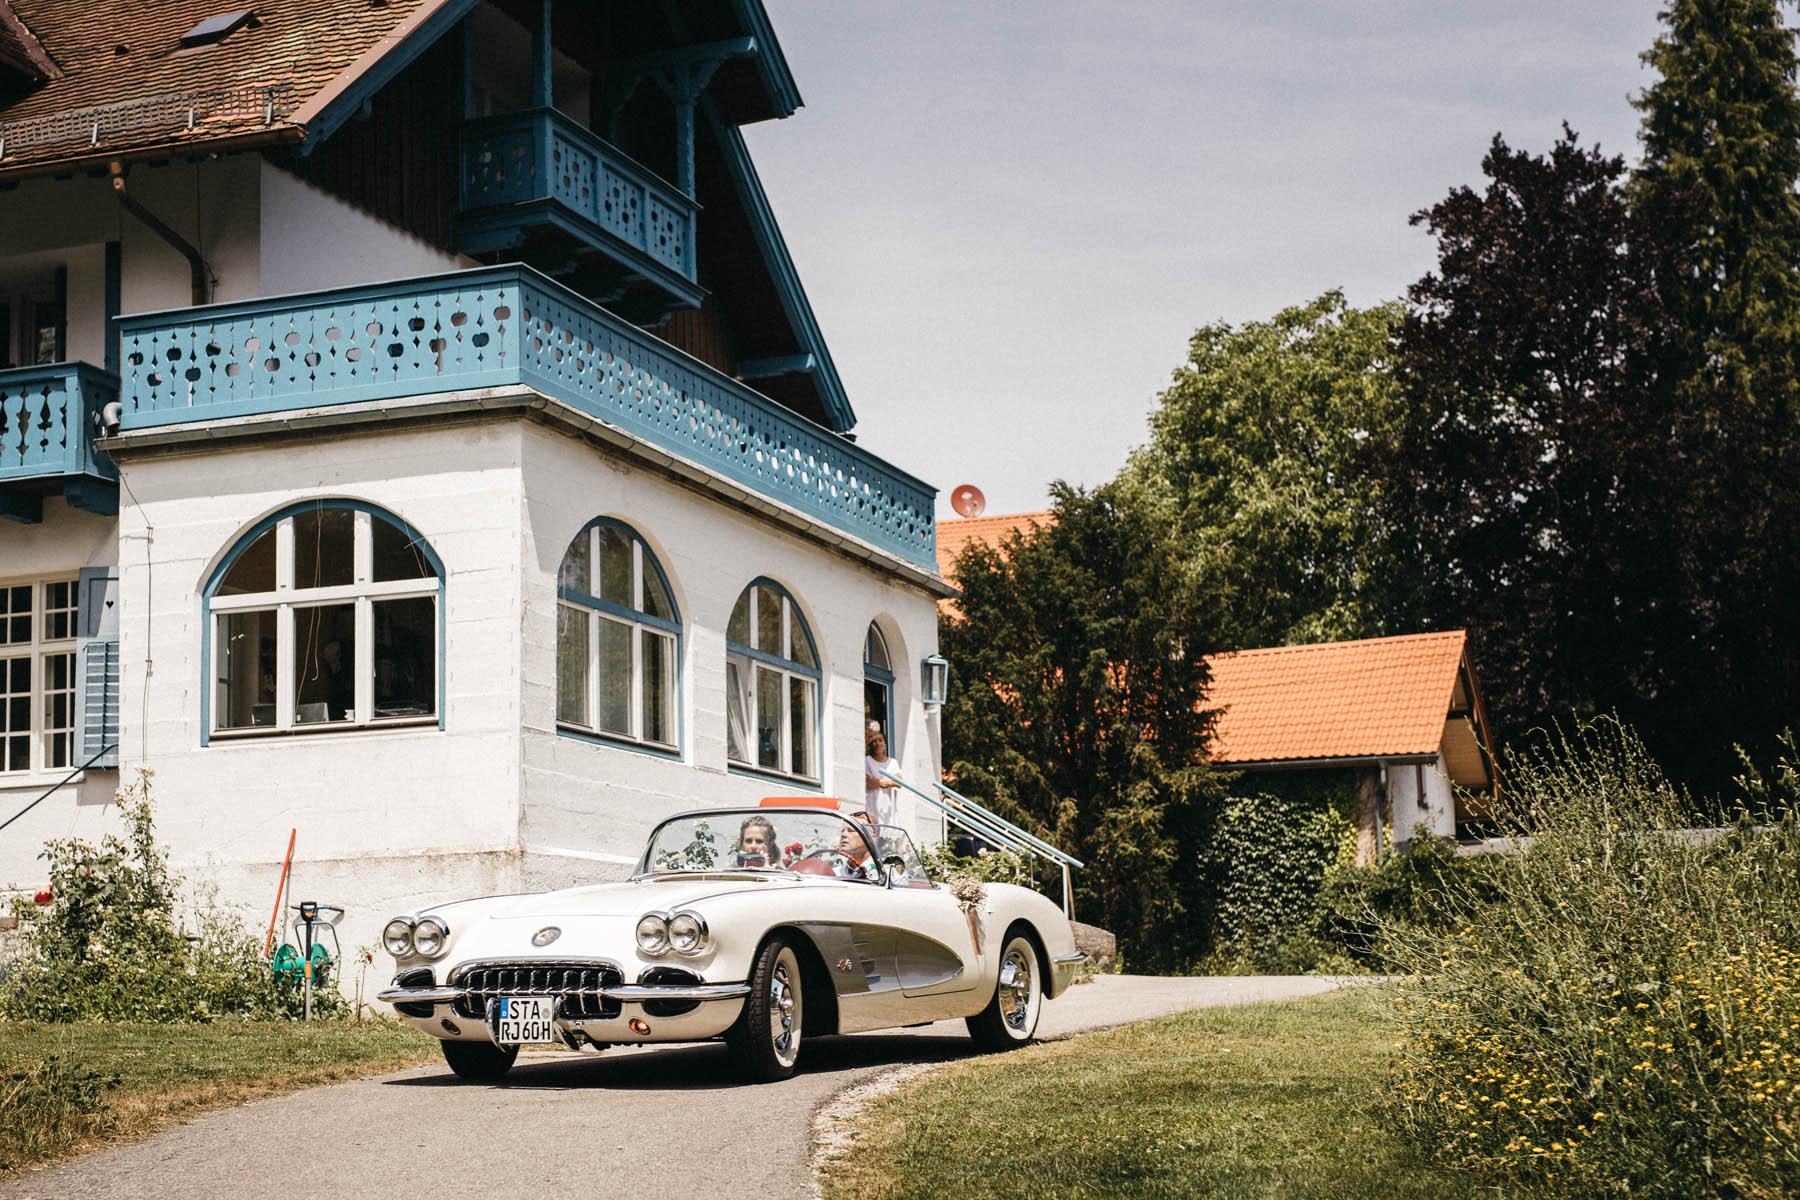 raissa simon fotografie hochzeit vintage starnberger see la villa 049 - Patricia + Maximilian